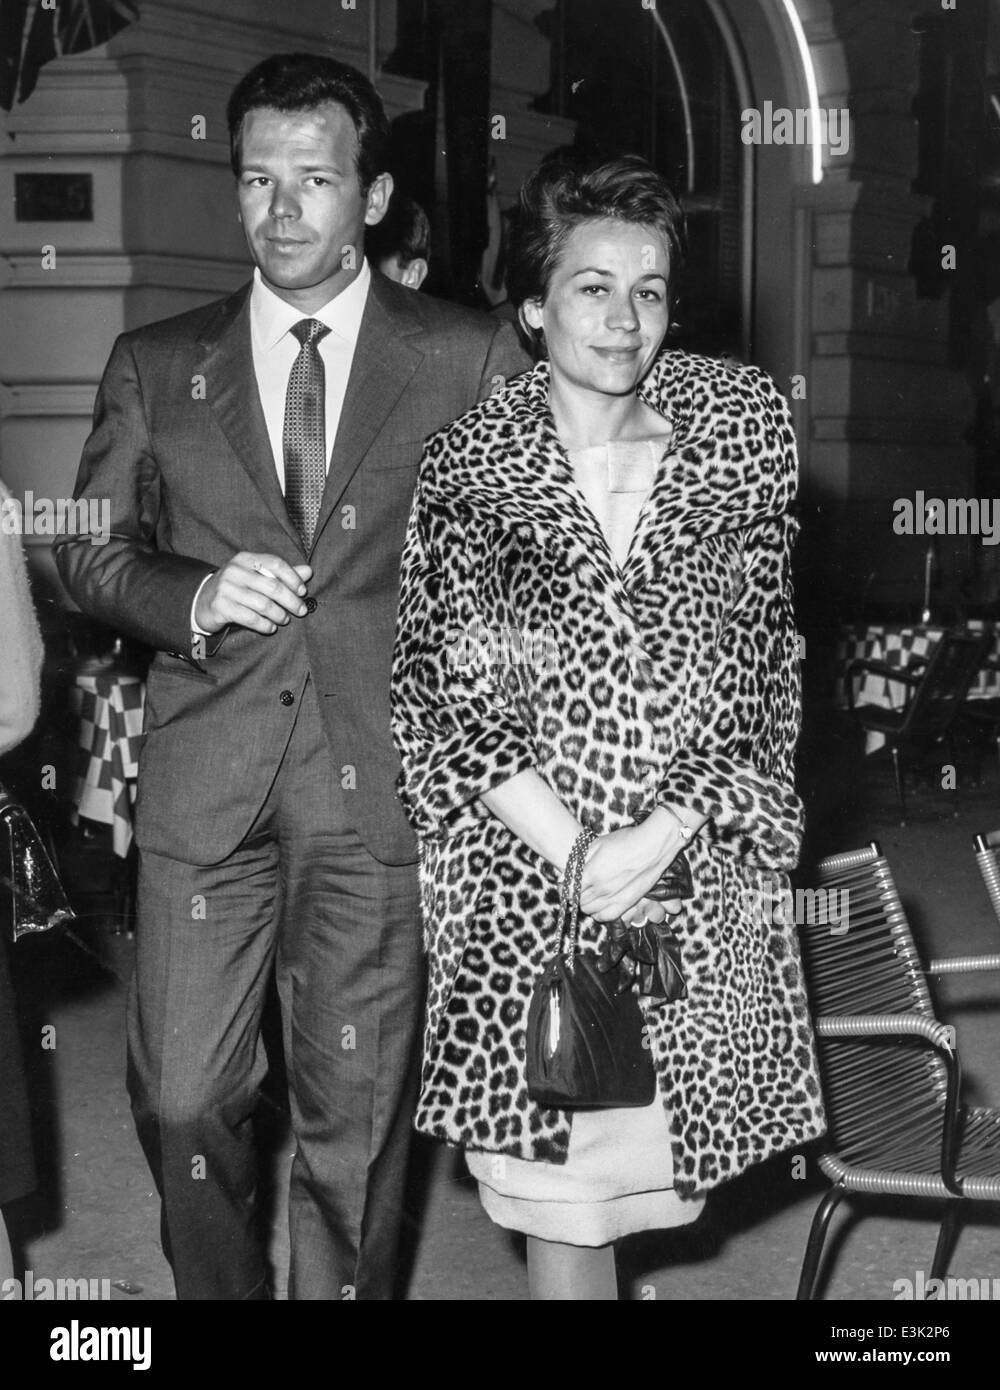 Annie Girardot et Renato salvatori,rome,1960 Banque D'Images